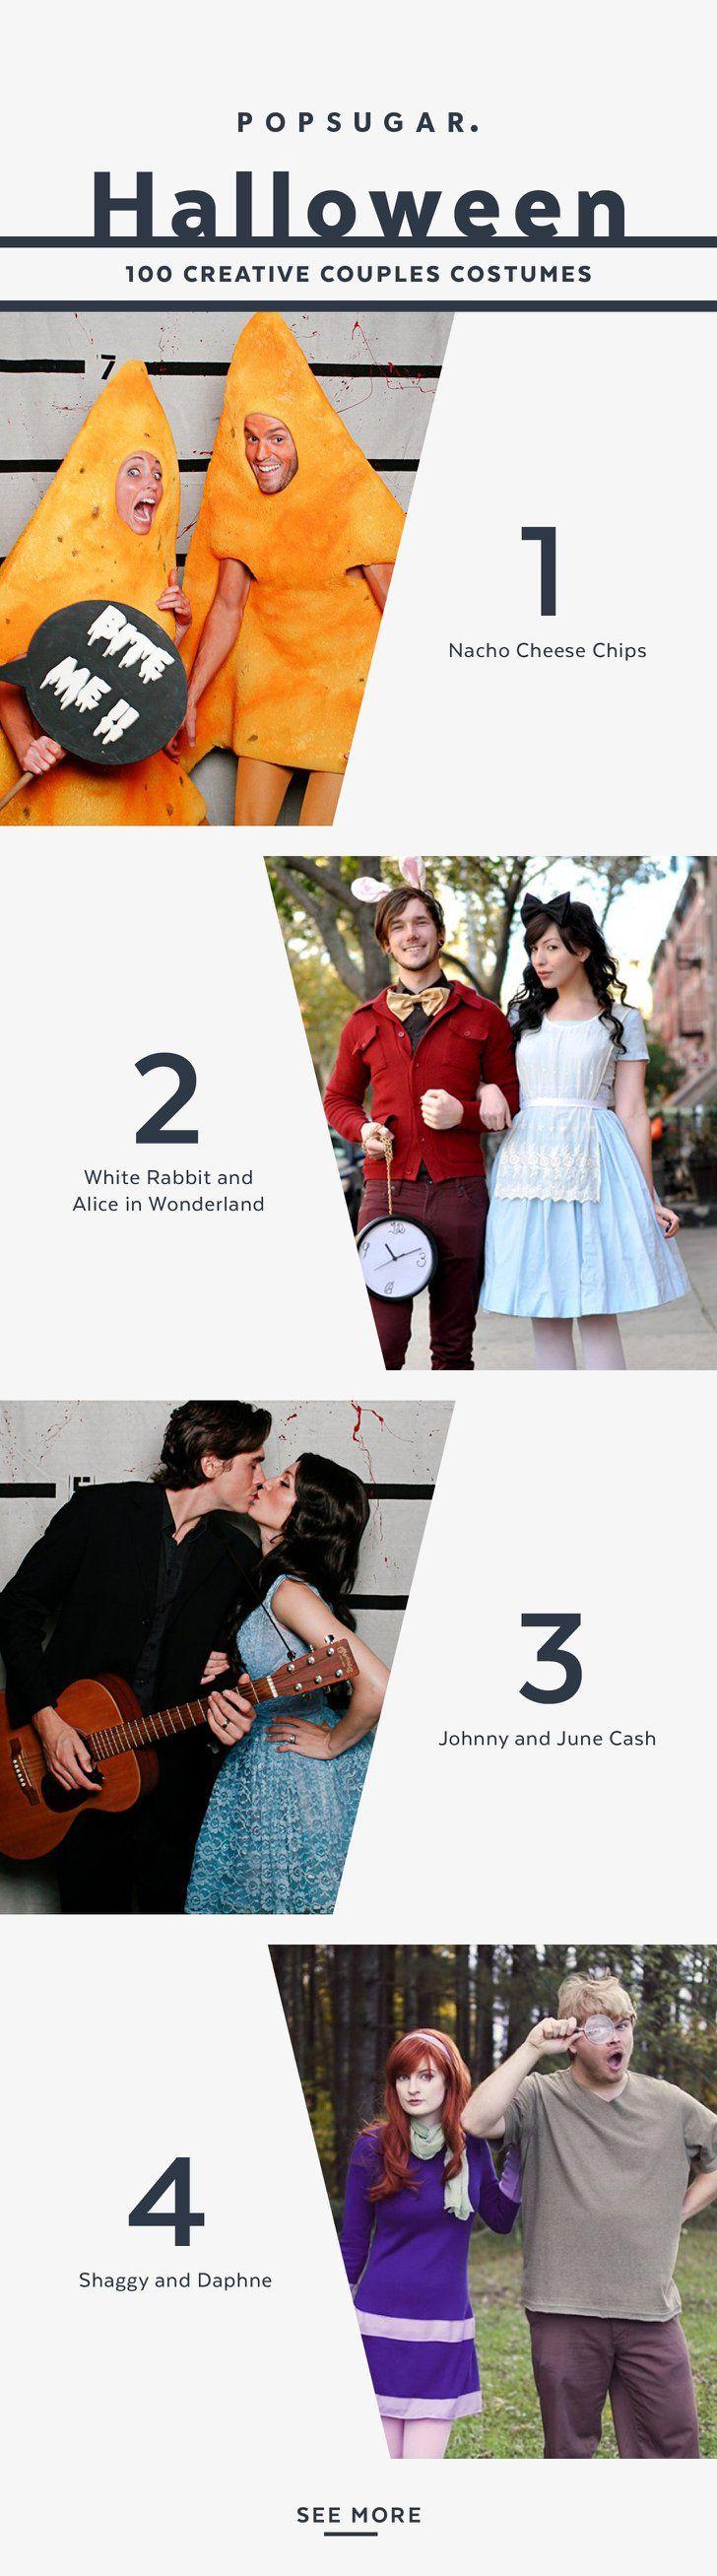 93 Creative Couples Costume Ideas